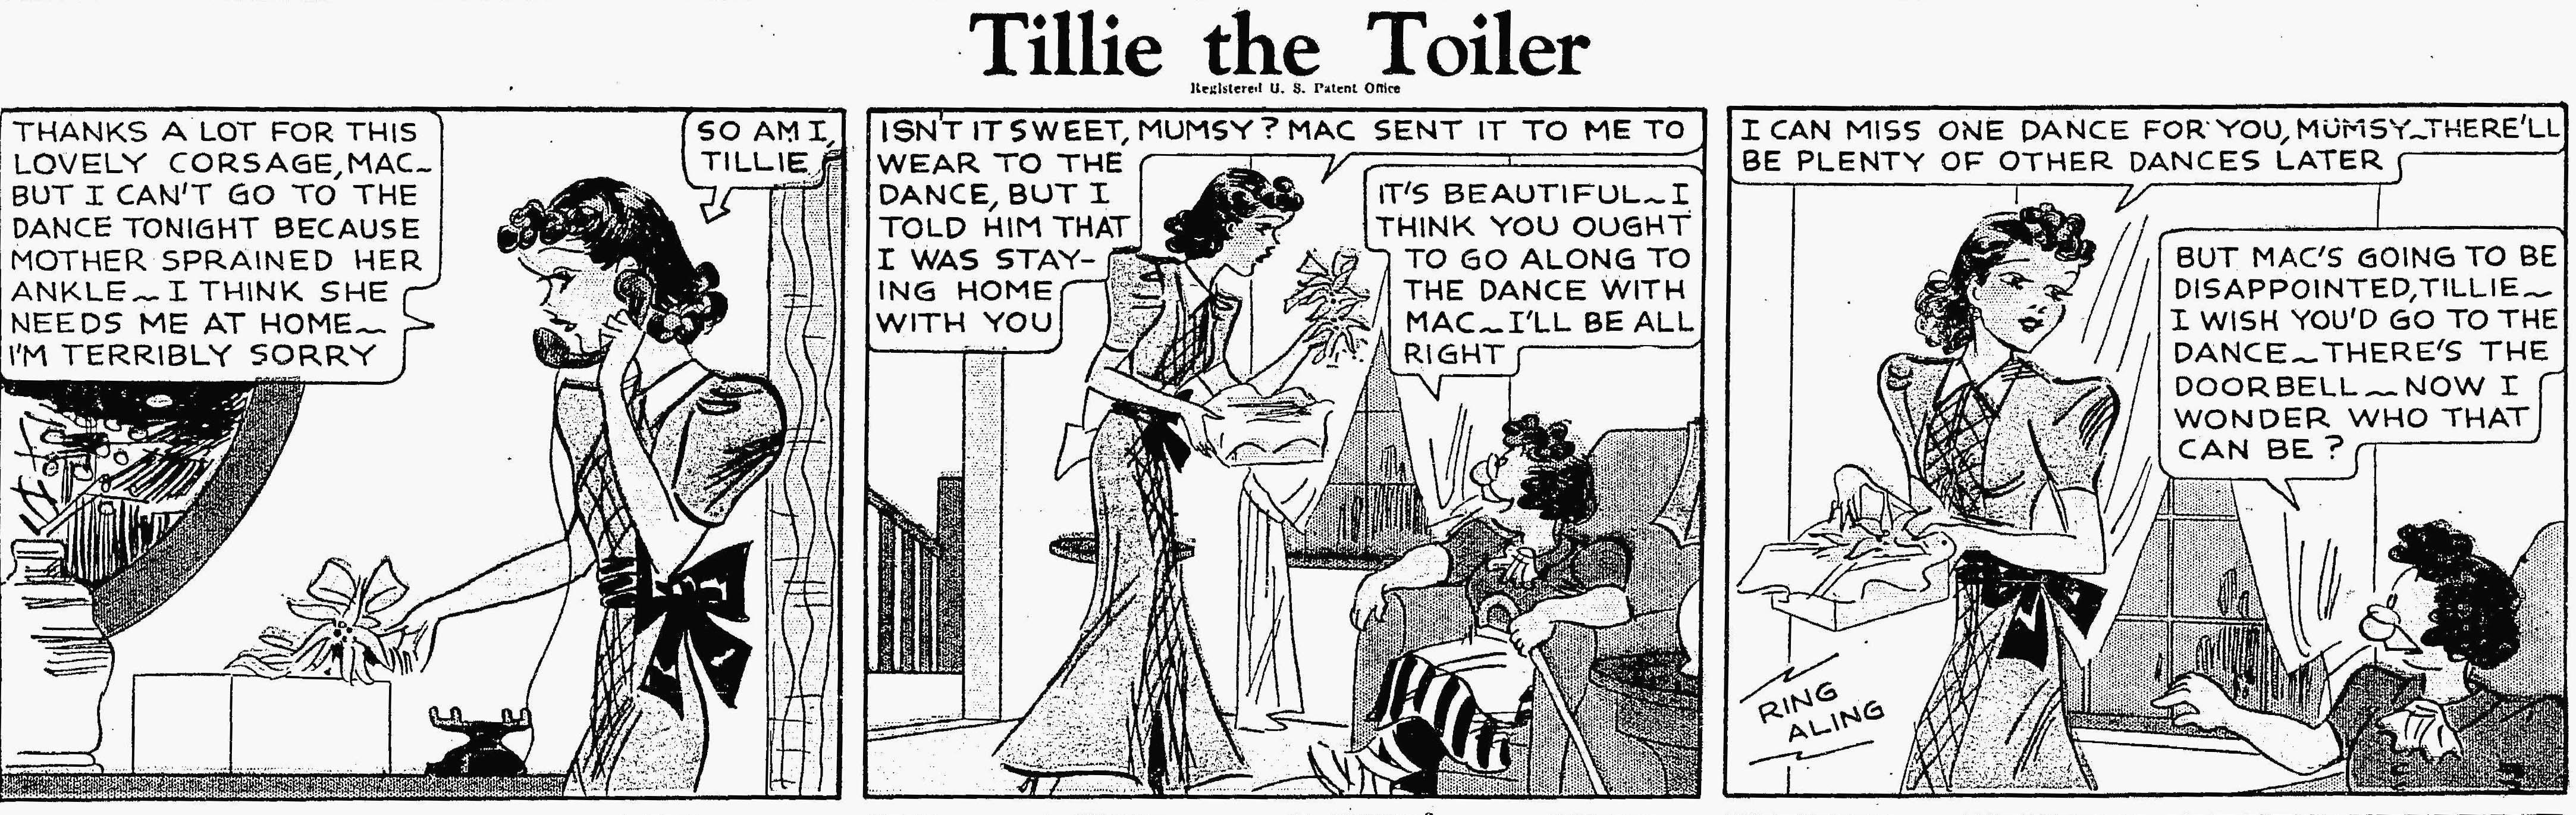 Tilly the toiler sex cartoons